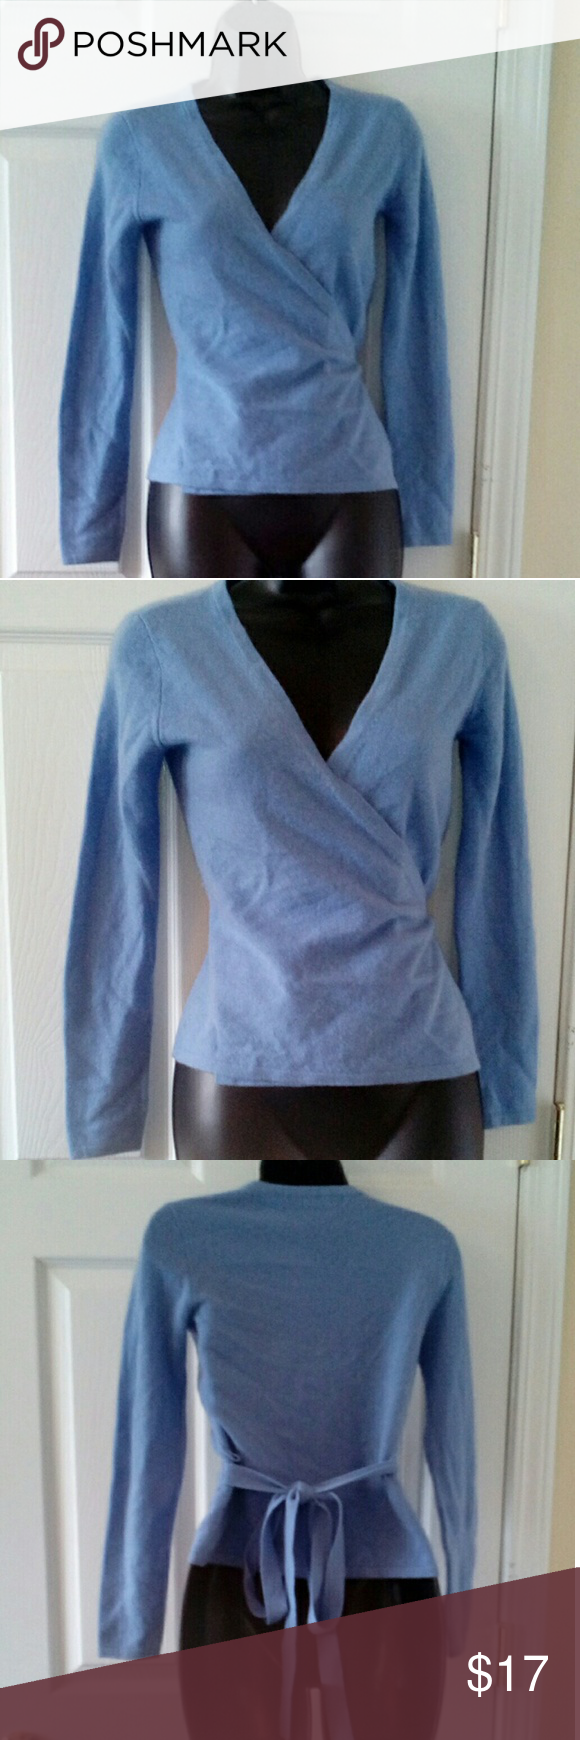 Moda International lilac 100% cashmere sweater XS 14